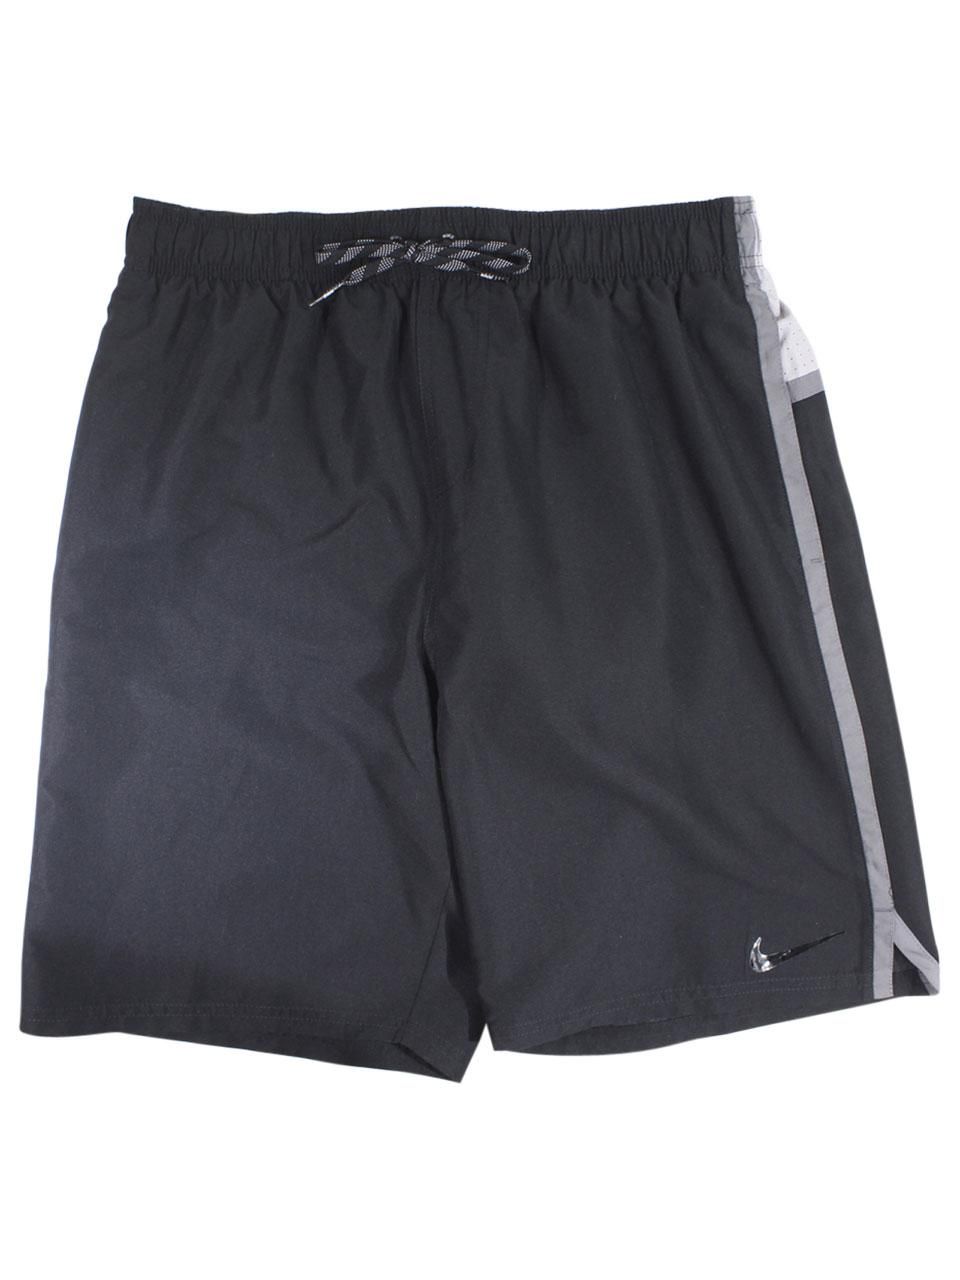 Nike Men's Solid Diverge 9-Inch Trunks Swimwear